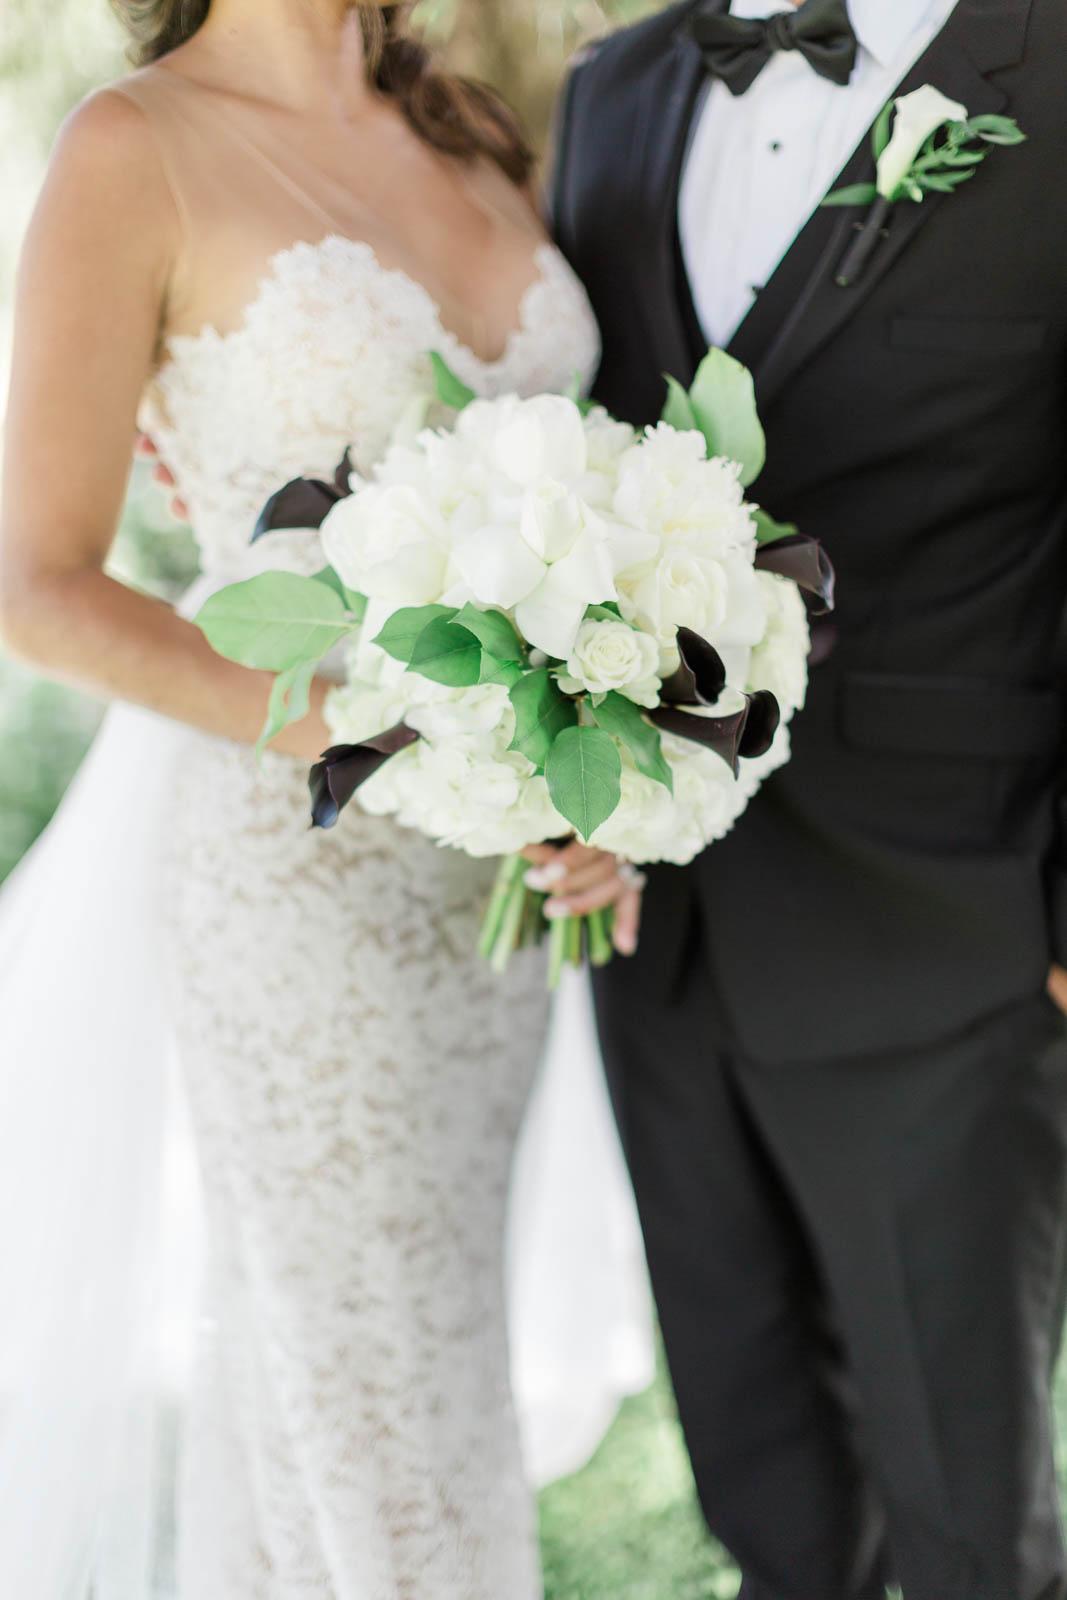 Bride holding white hydrangea bouquet with dark purple calla lilies.